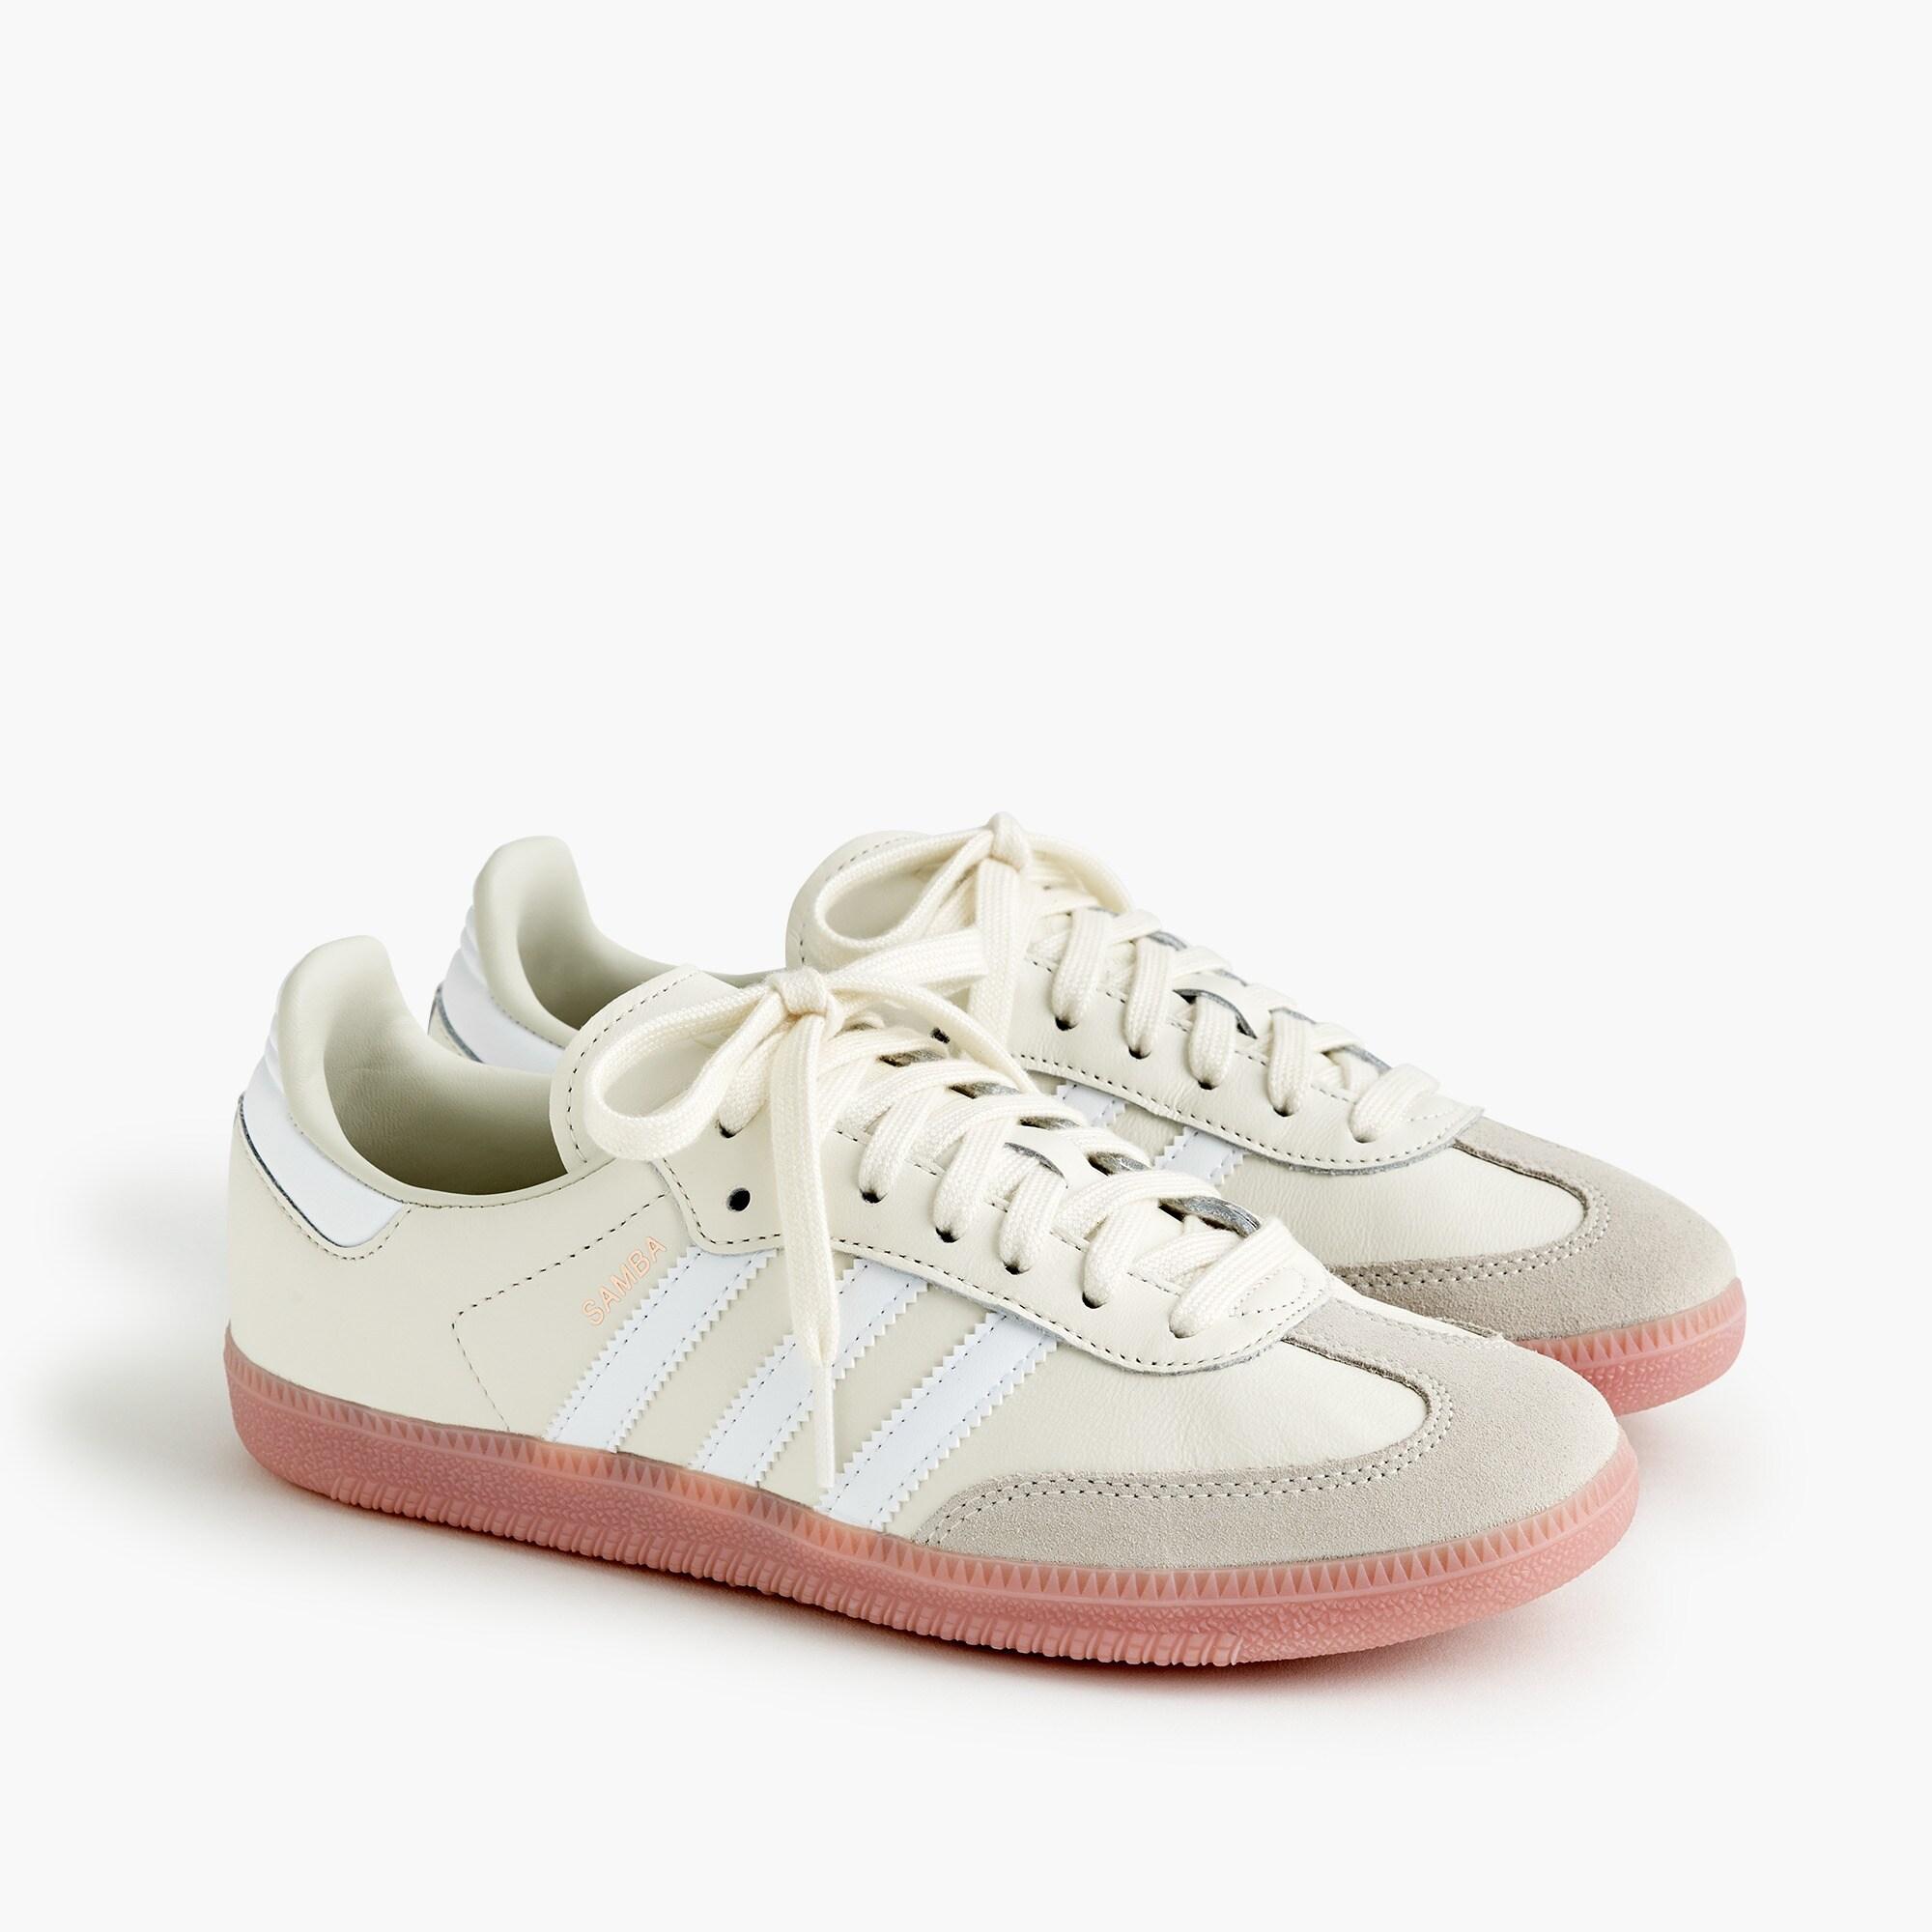 Adidas® Samba sneakers